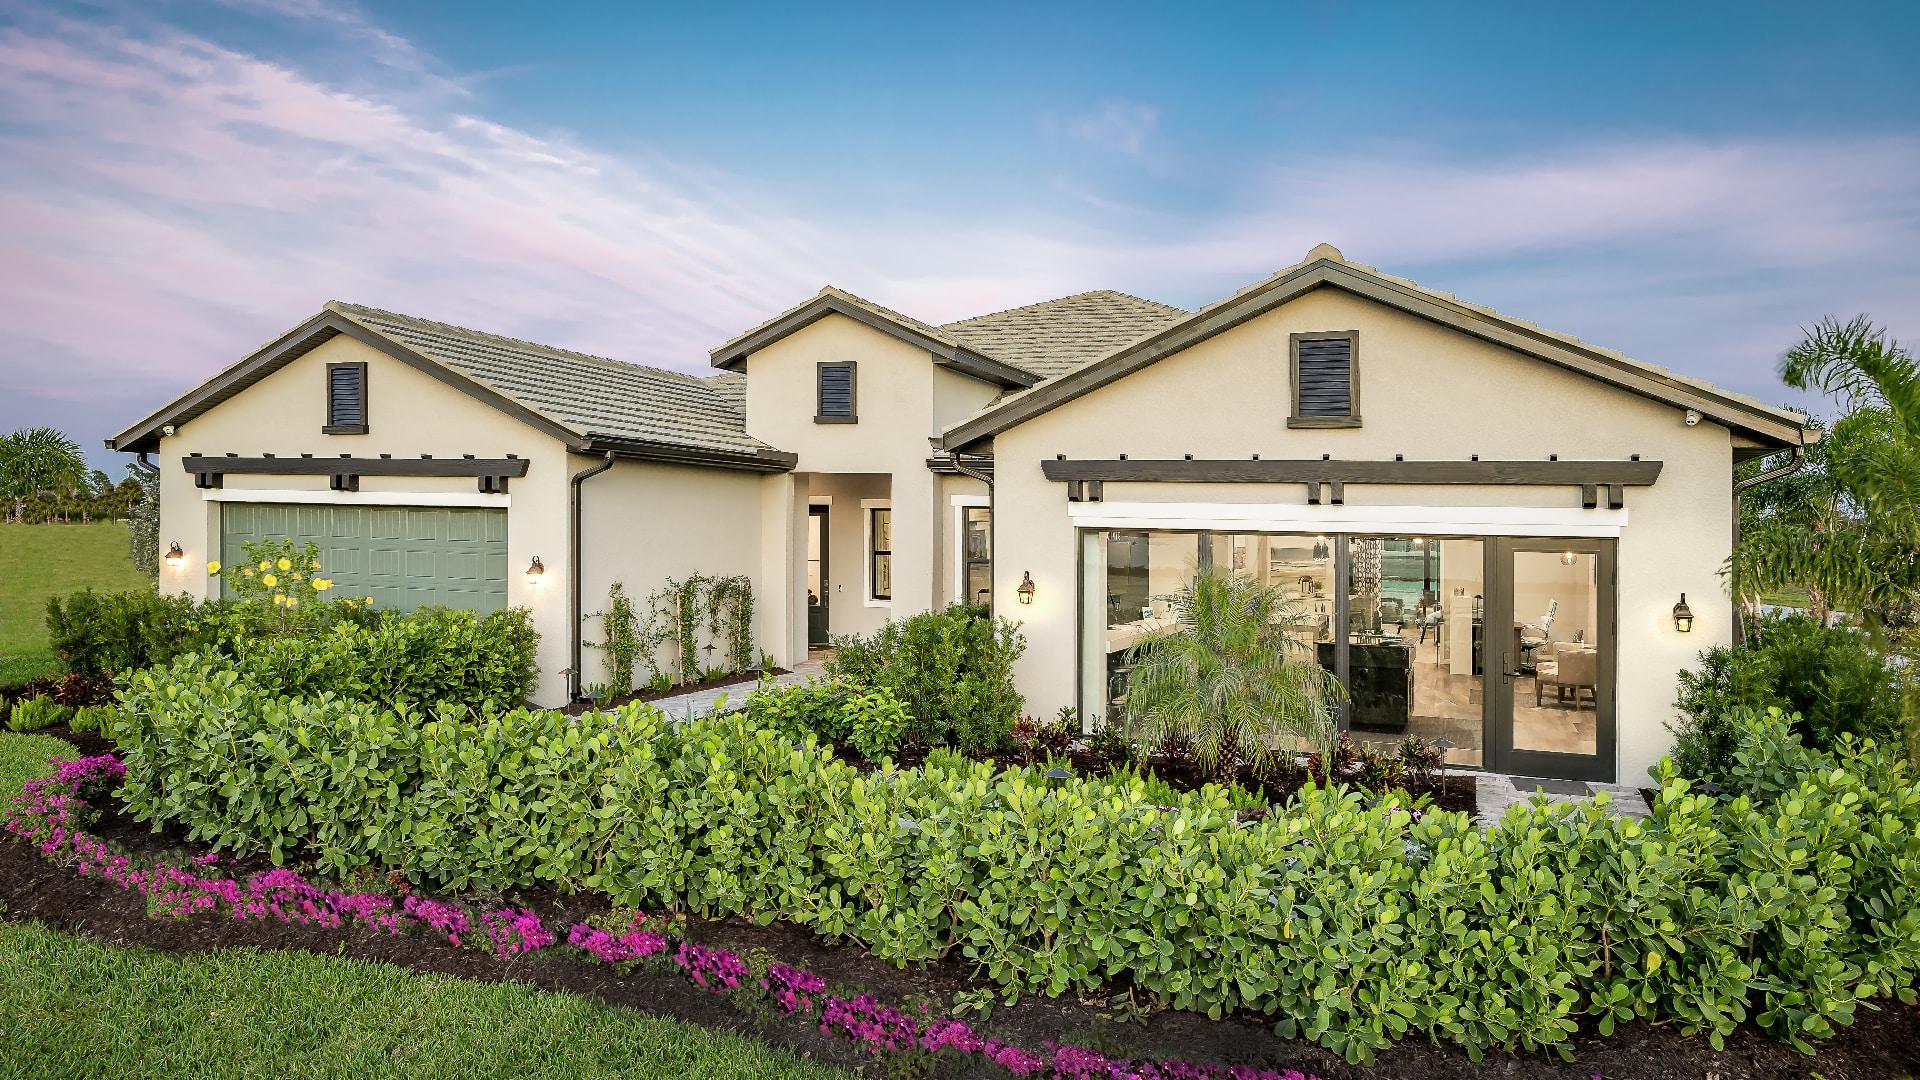 Spacious attached villas